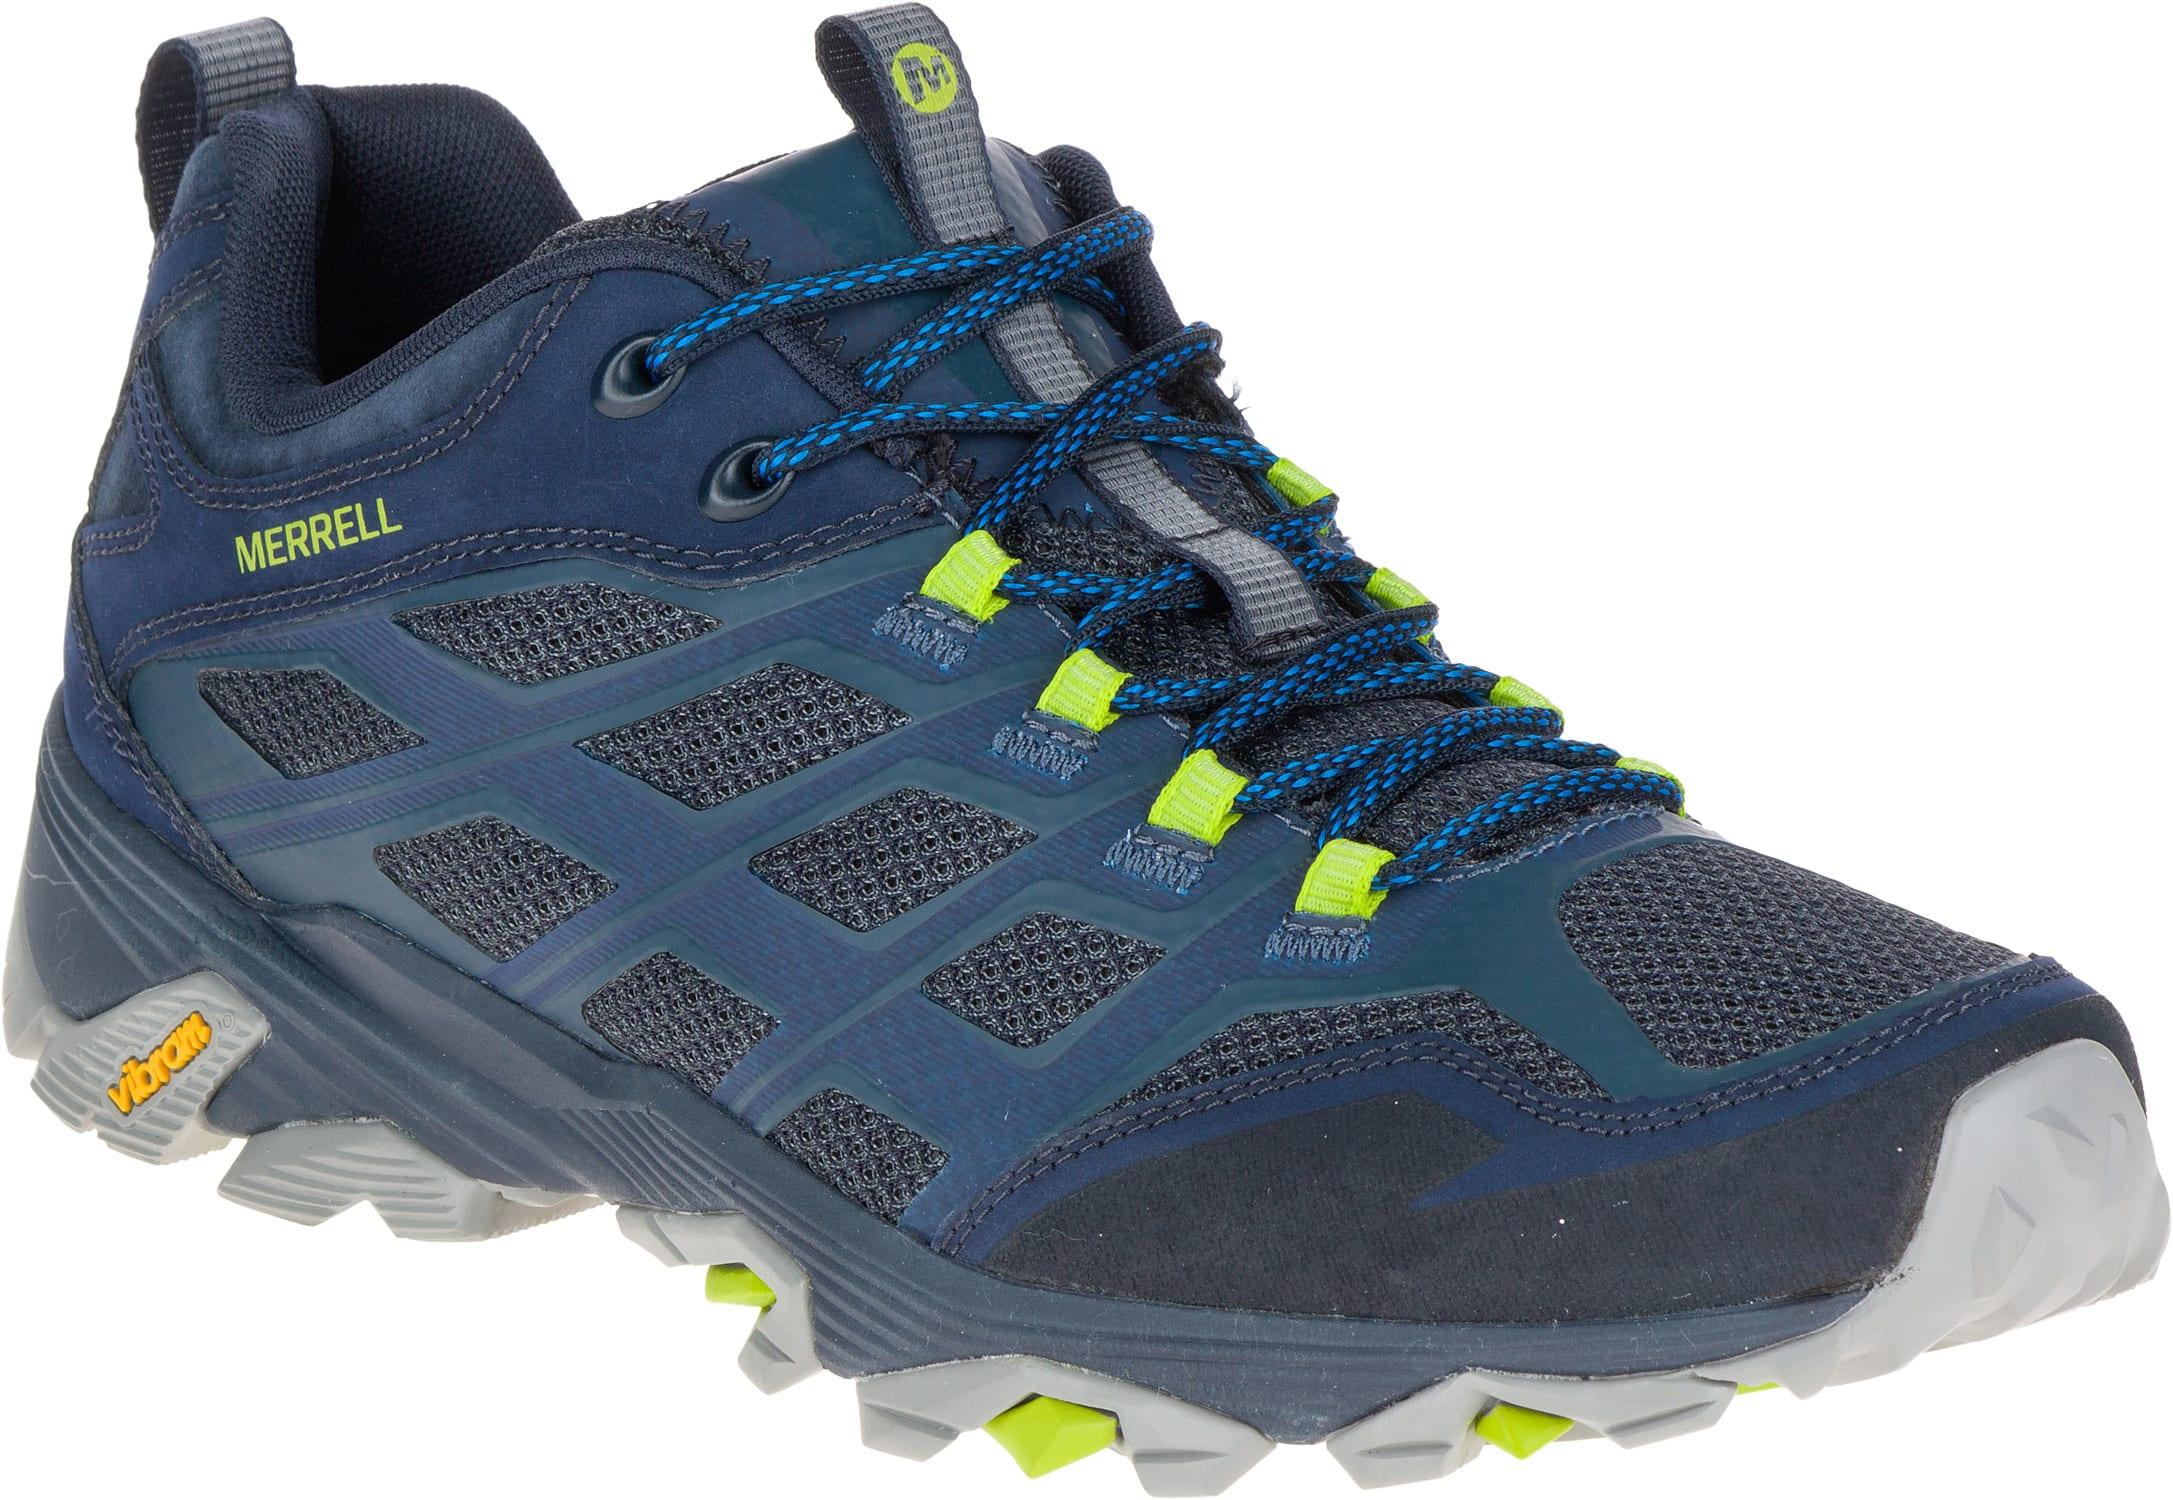 Merrell Moab Fst Hiking Shoes